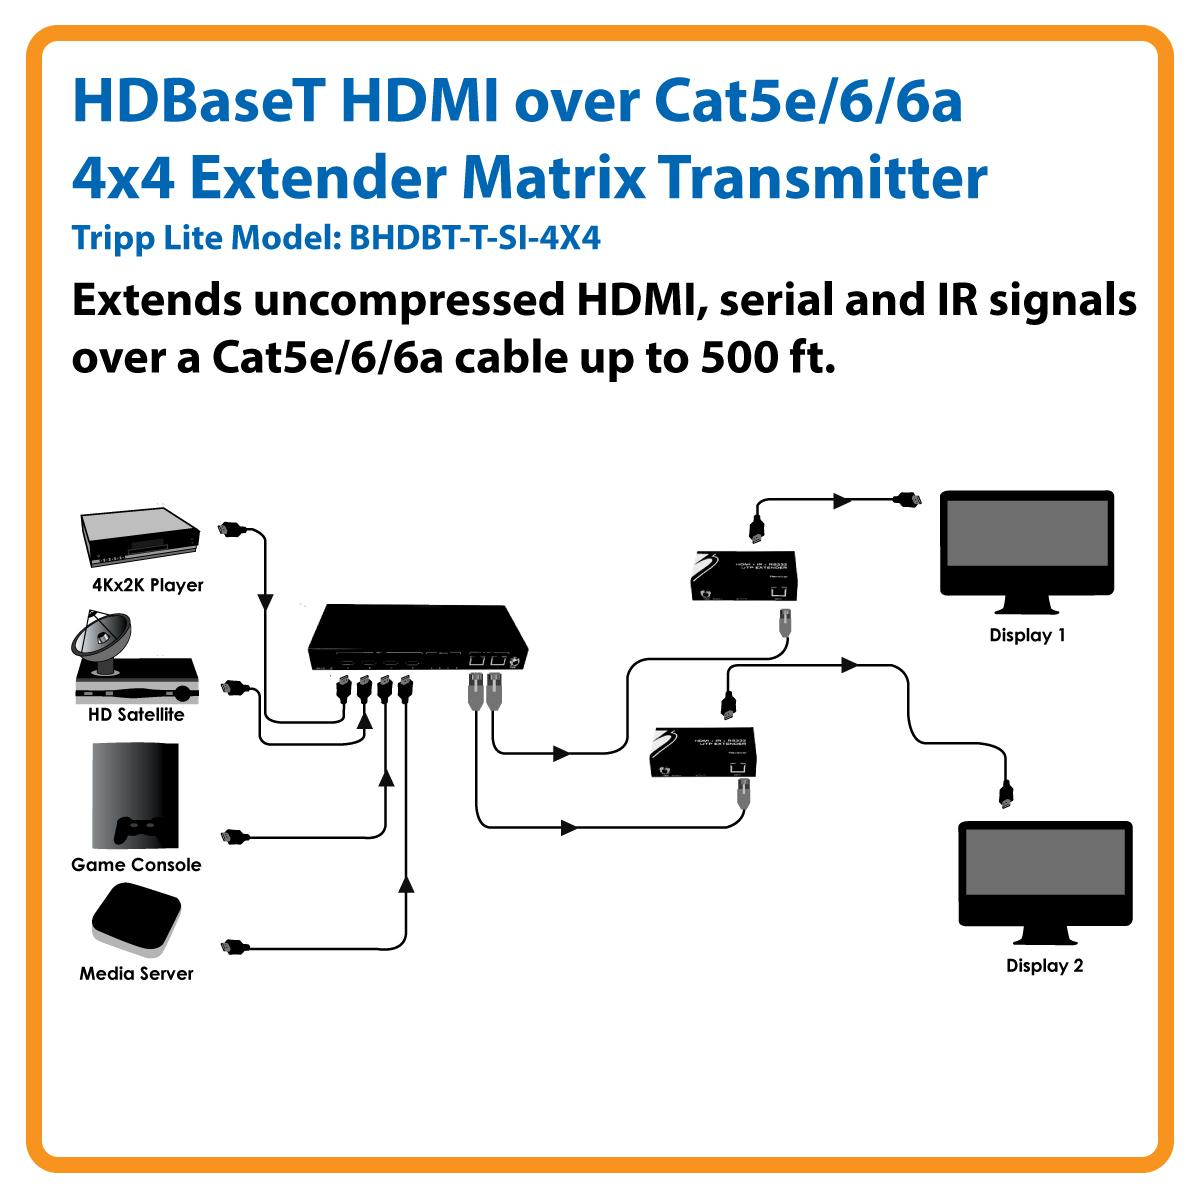 Tripp Lite Hdbaset Hdmi Over Cat5e 6 6a 4x4 Extender Details About Cat6 Matrix Auto Switch Splitter Serial And Ir Control Transmitter